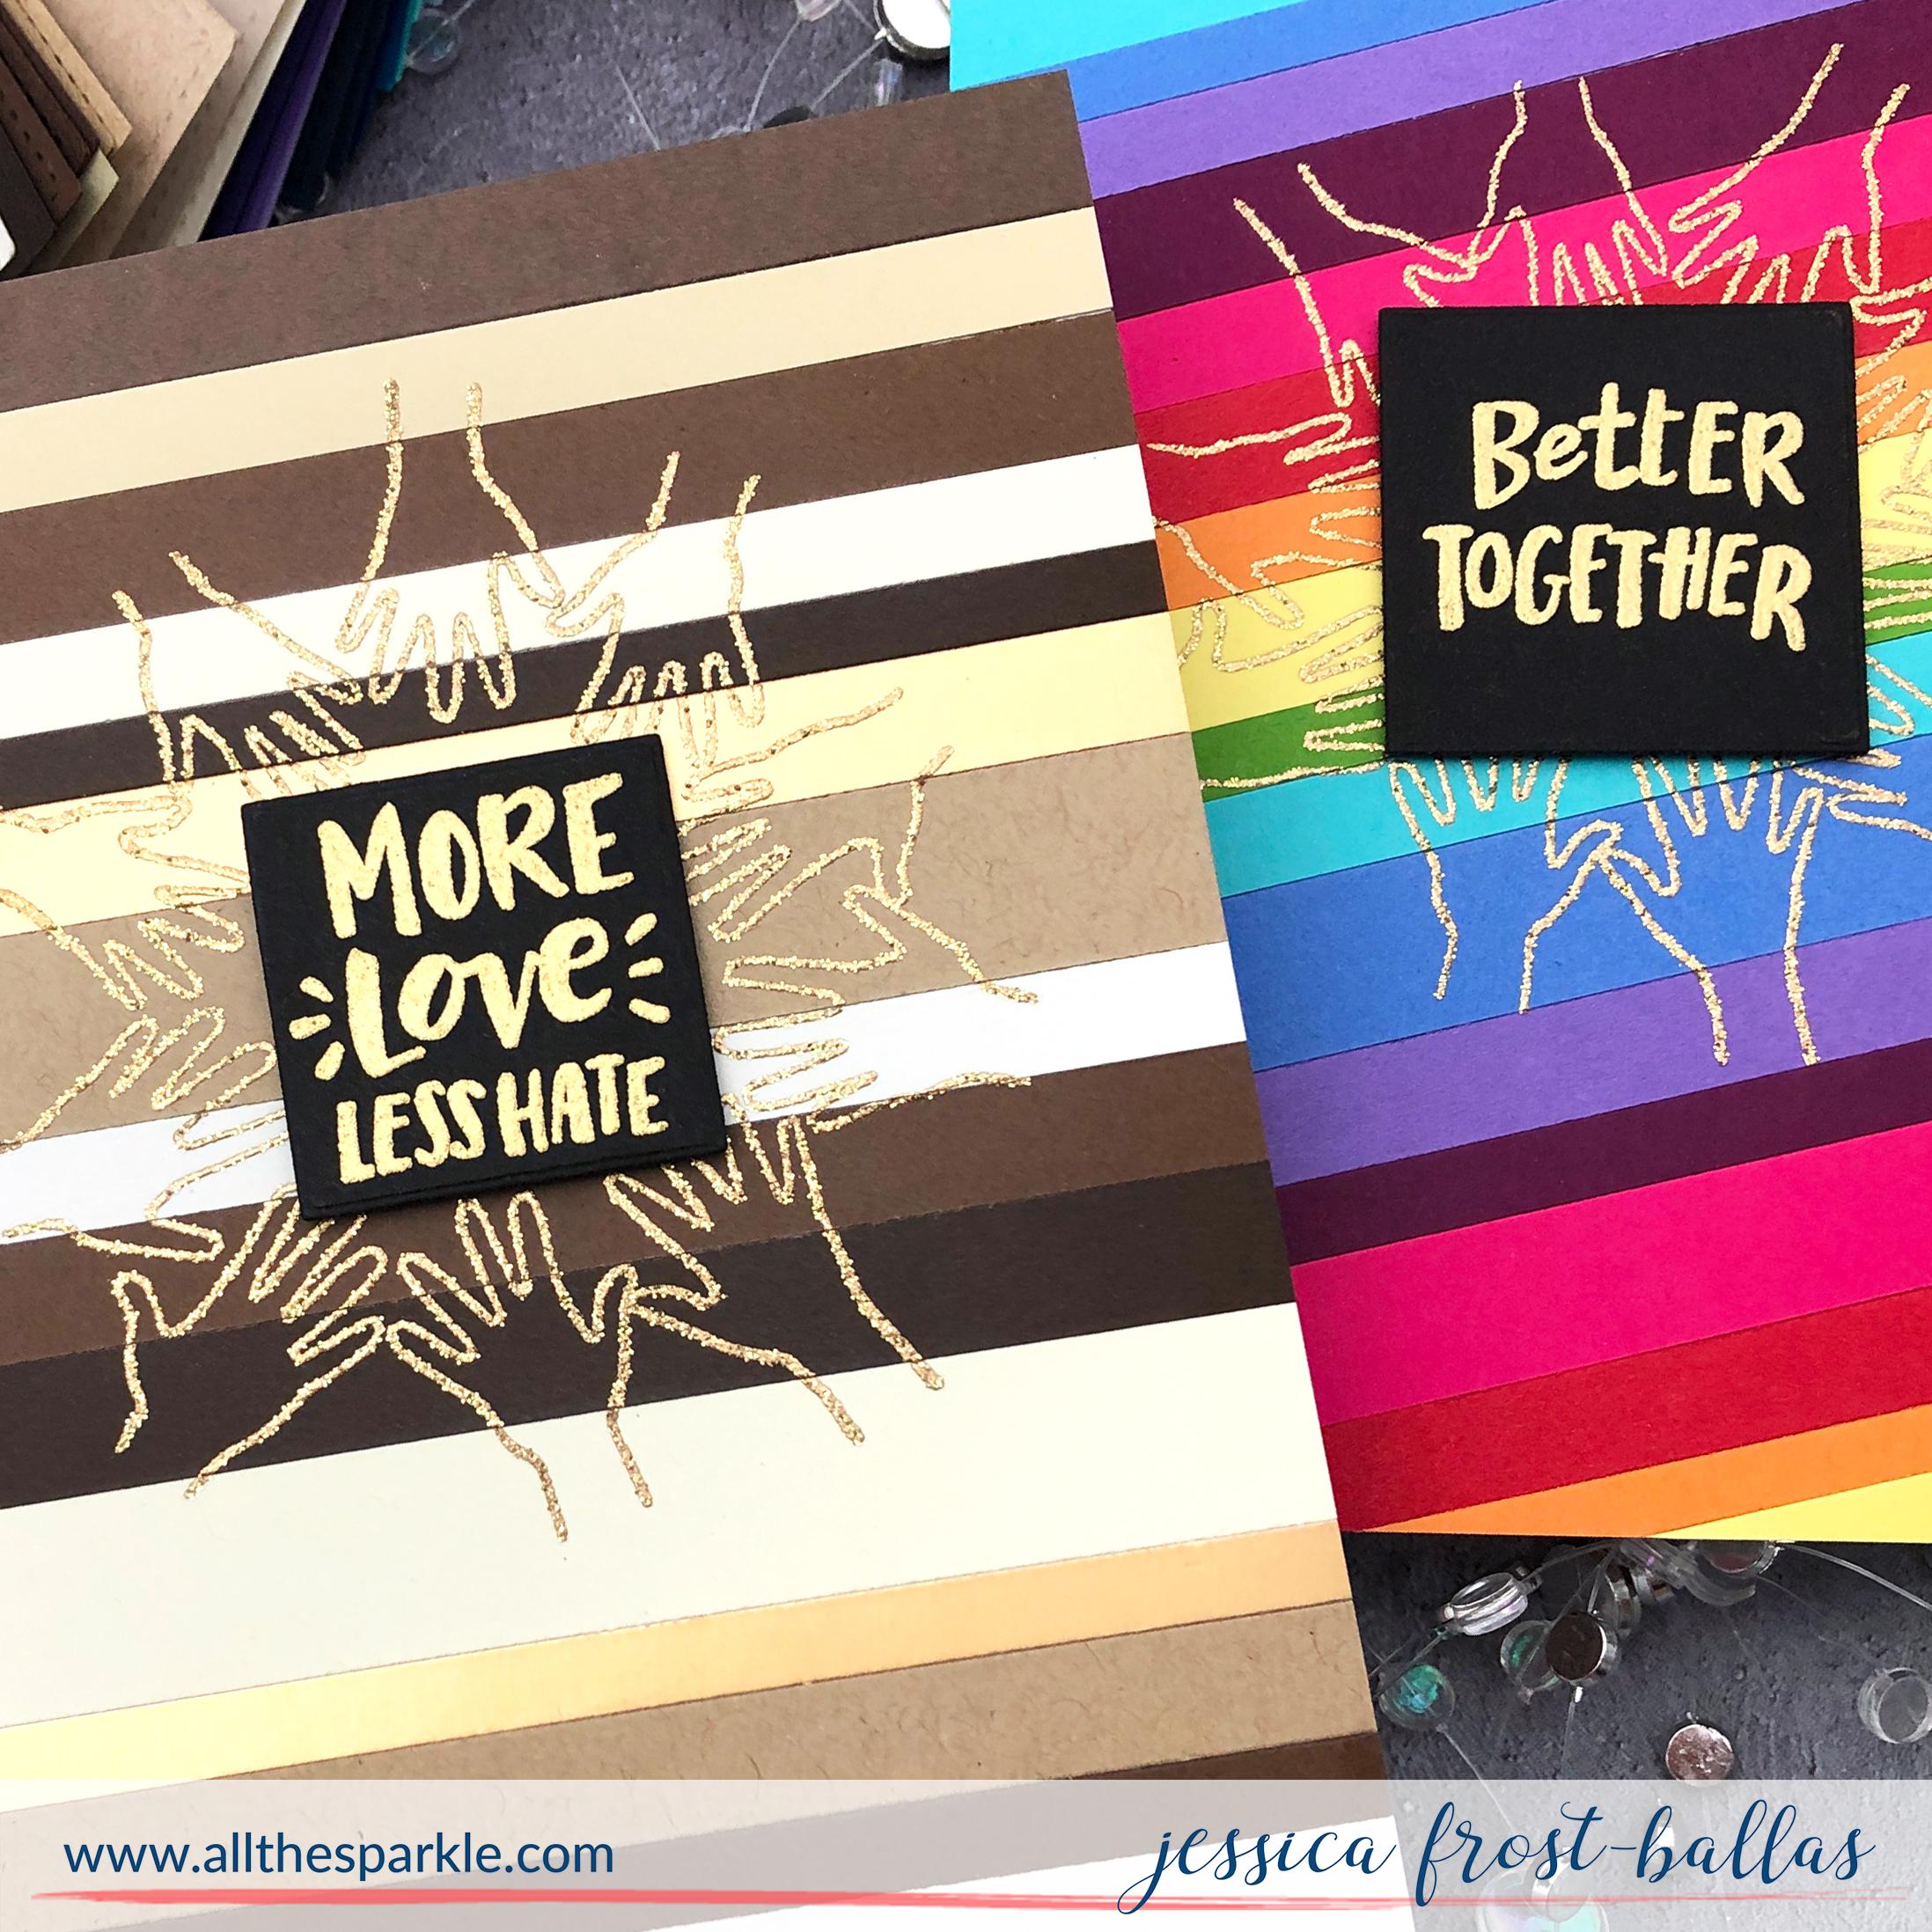 You Matter by Jessica Frost-Ballas for Reverse Confetti